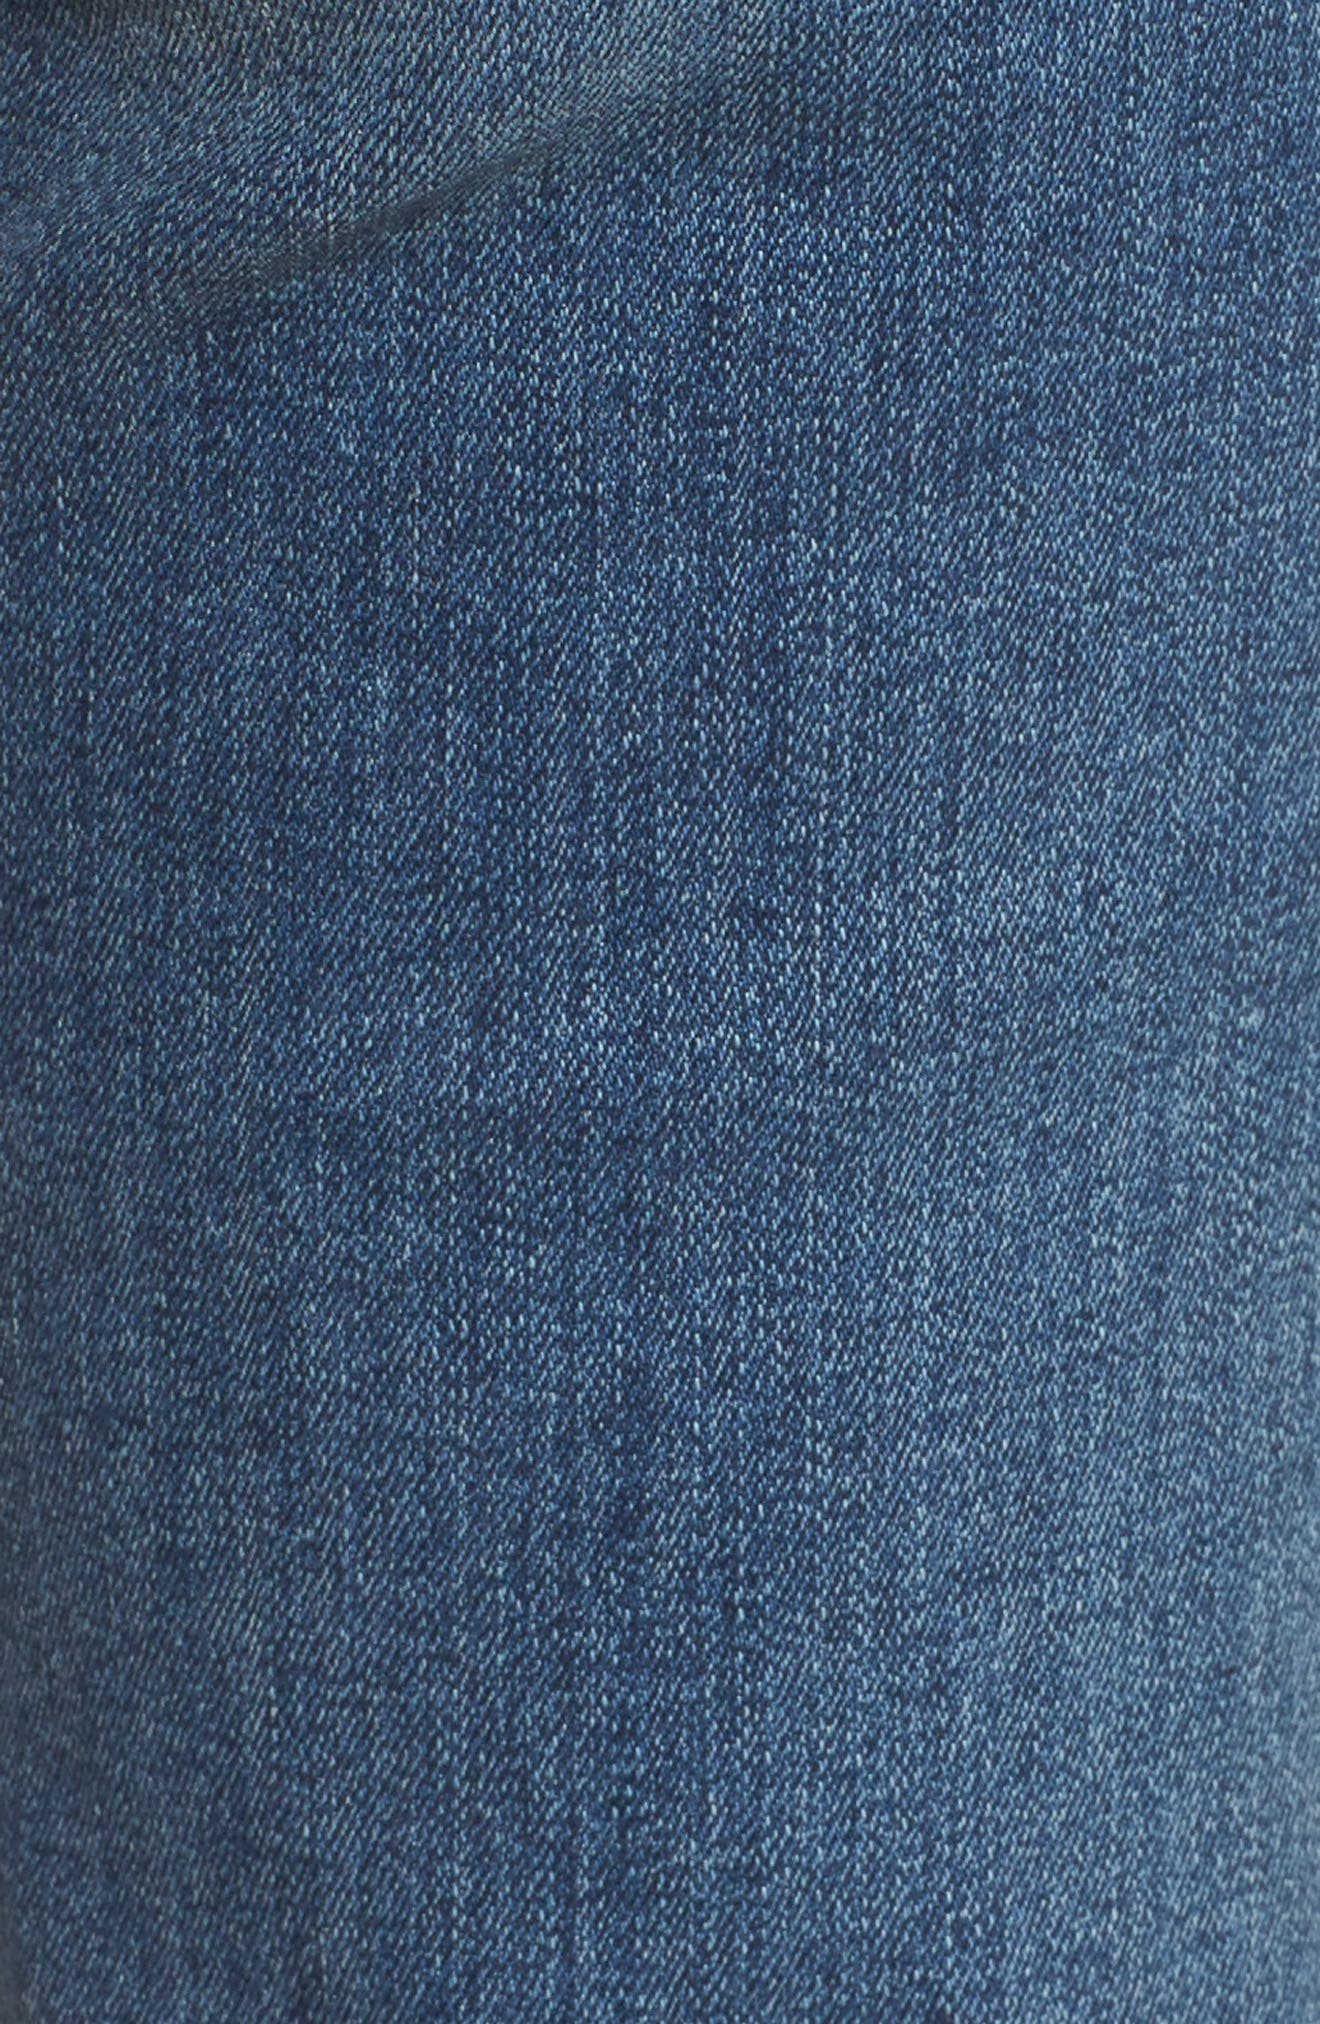 Alternate Image 5  - 7 For All Mankind® 'Dojo' Wide Leg Jeans